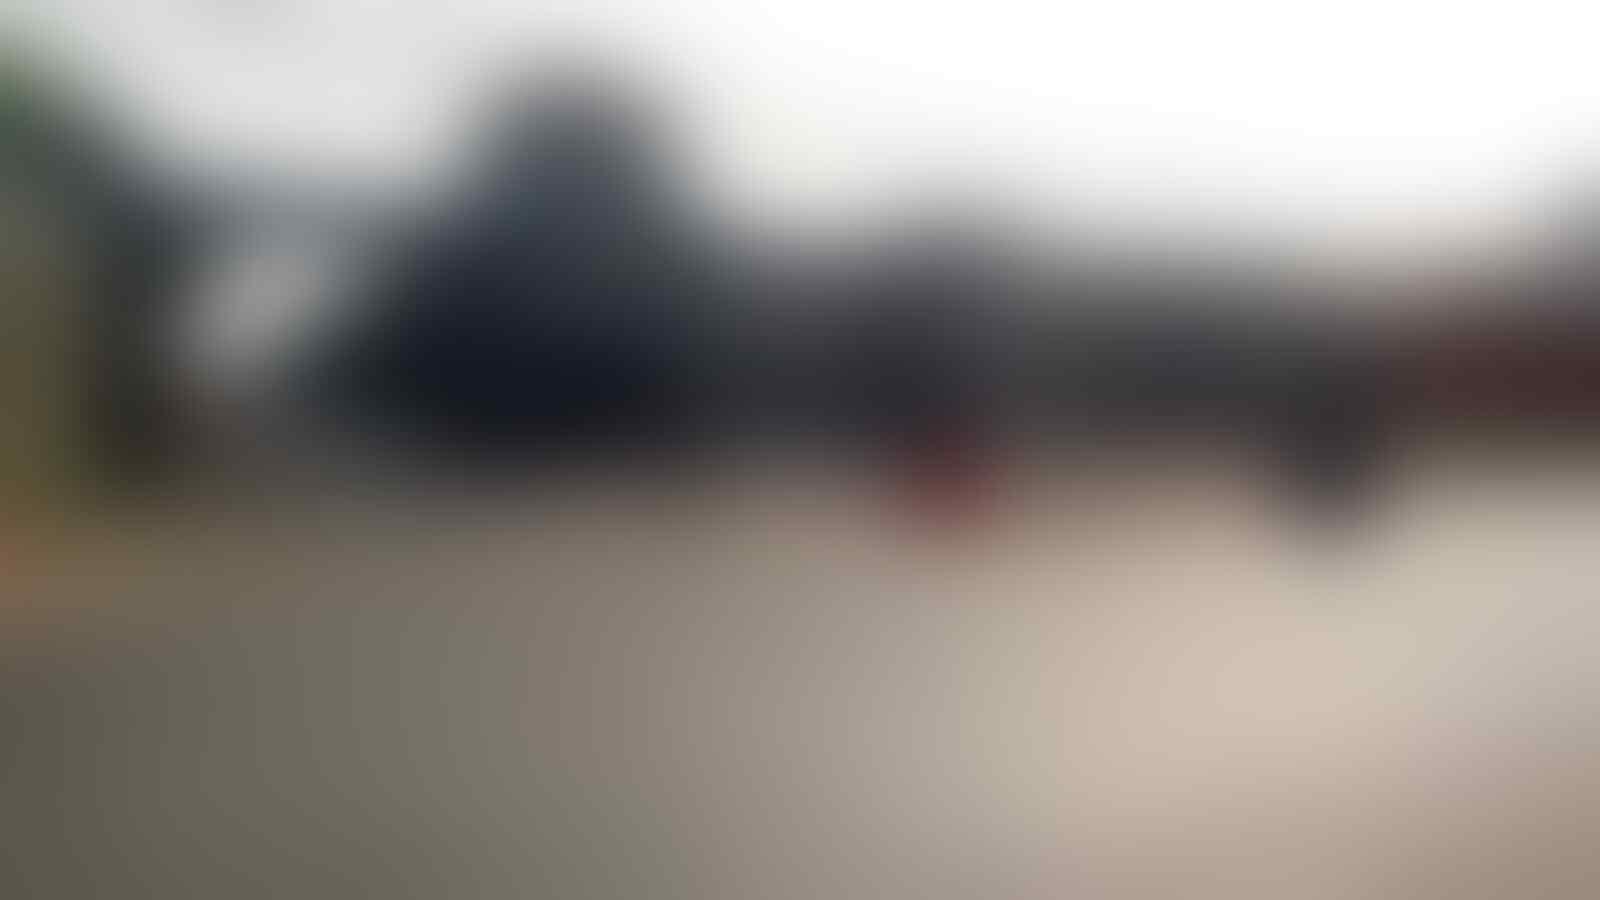 Mako Brimob Dijaga Ketat Usai Rusuh Napi Teroris vs Petugas